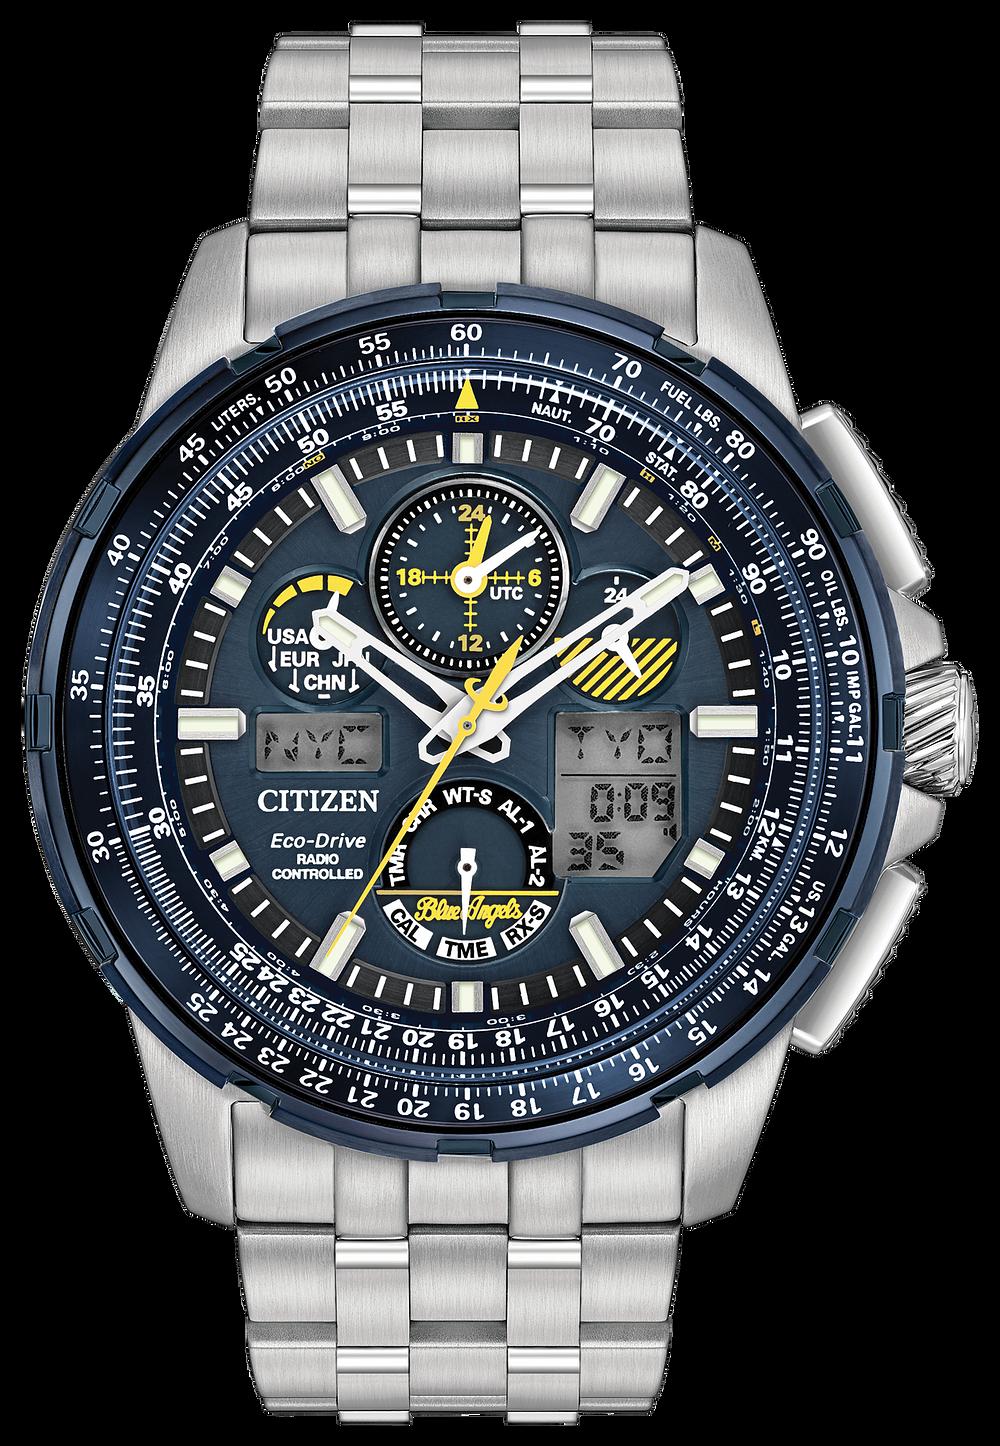 231b8f7d0 Promaster Skyhawk - Eco-Drive JY8058-50L Chronograph Watch